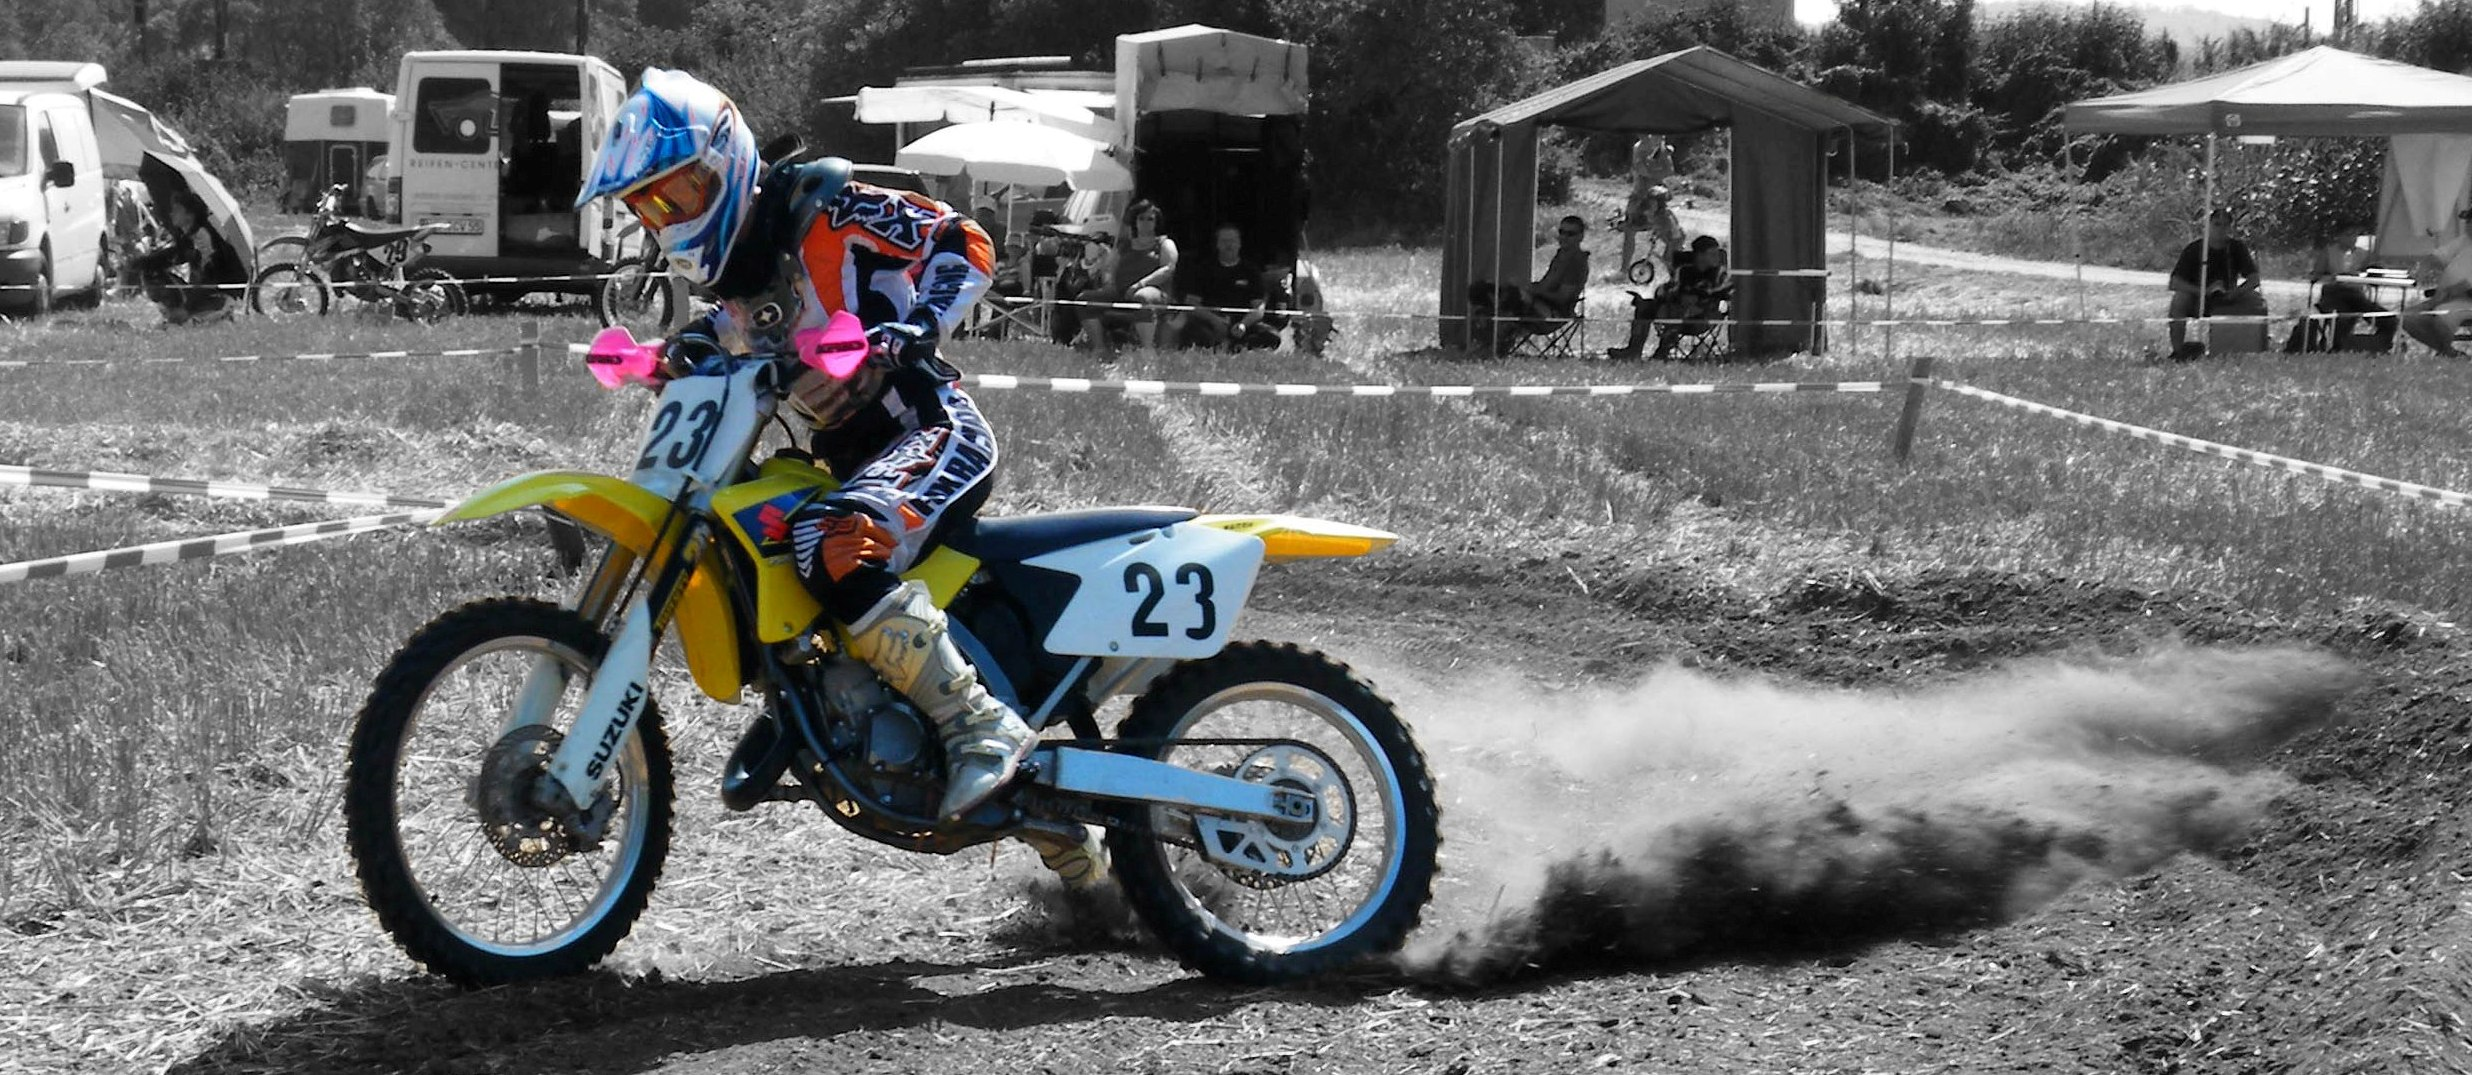 Motocross s/w